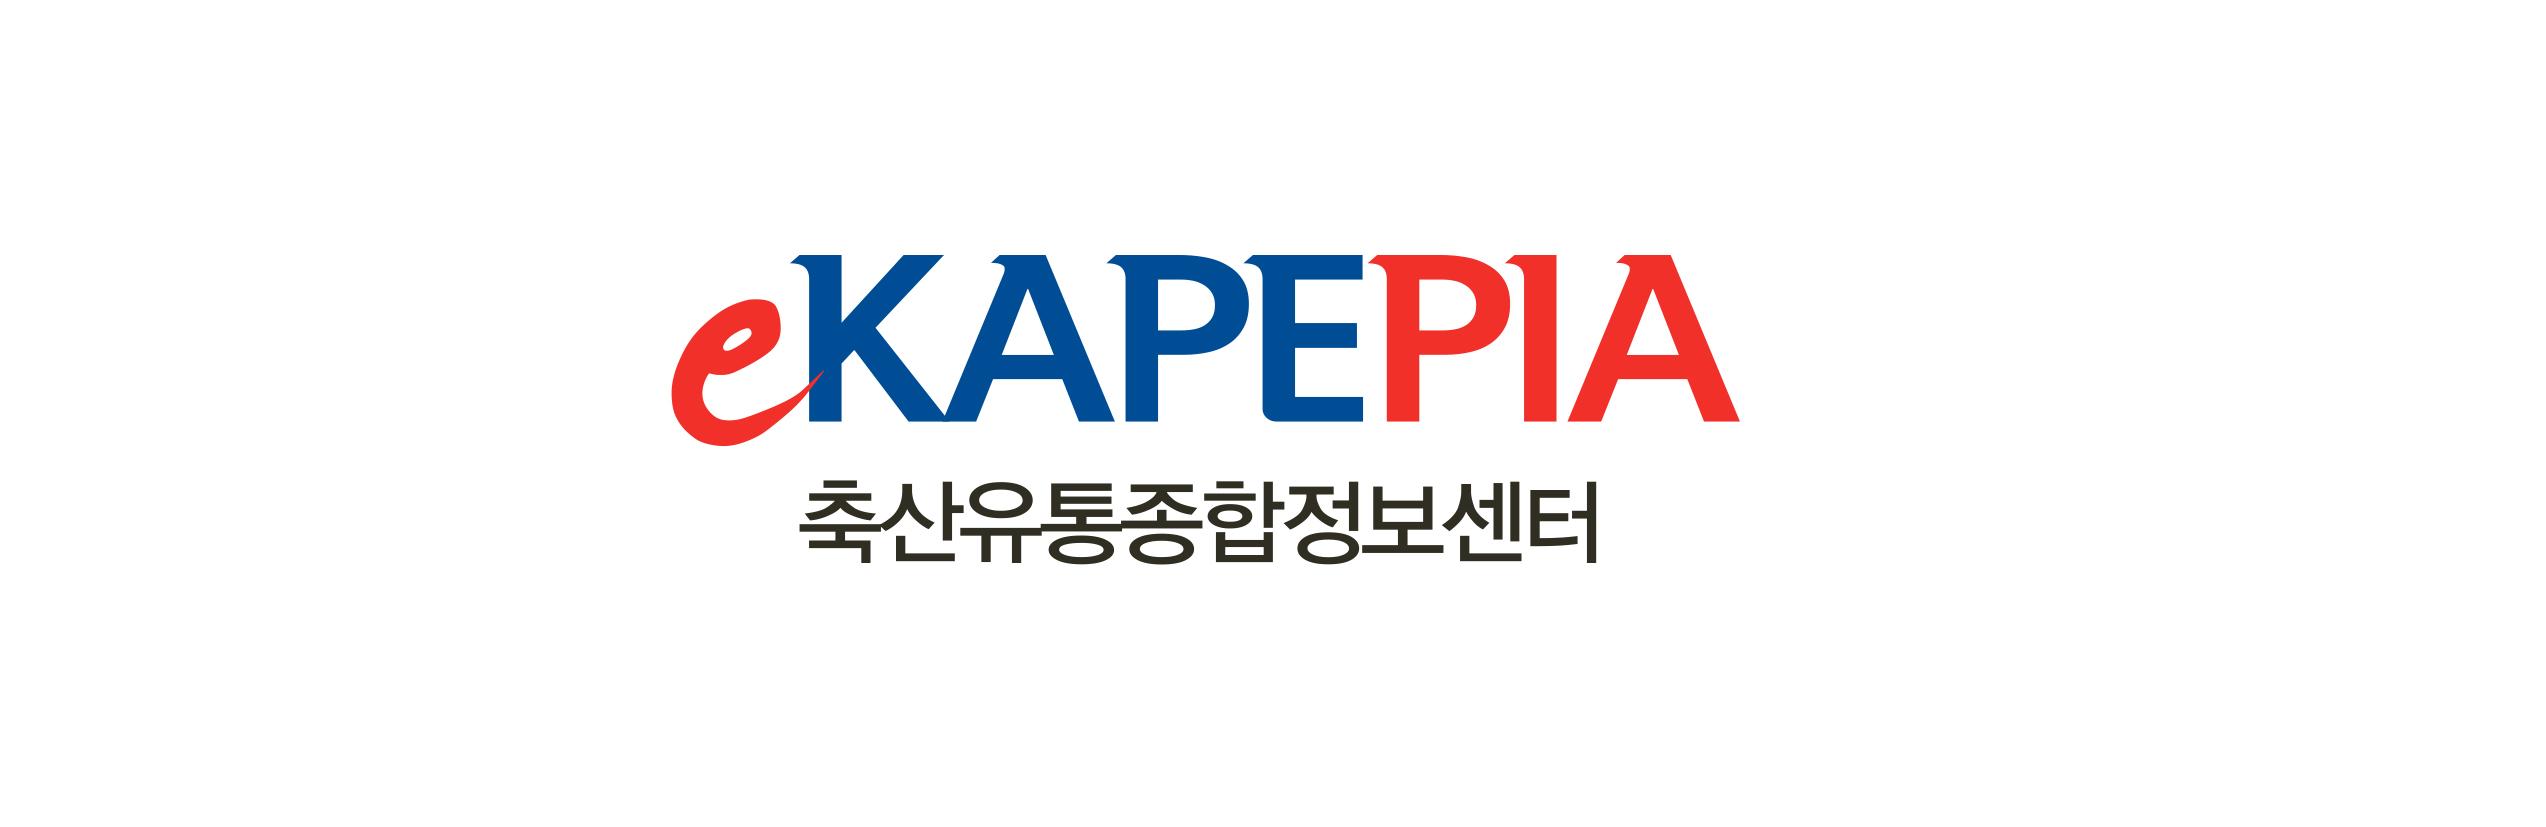 ekapepia.jpg